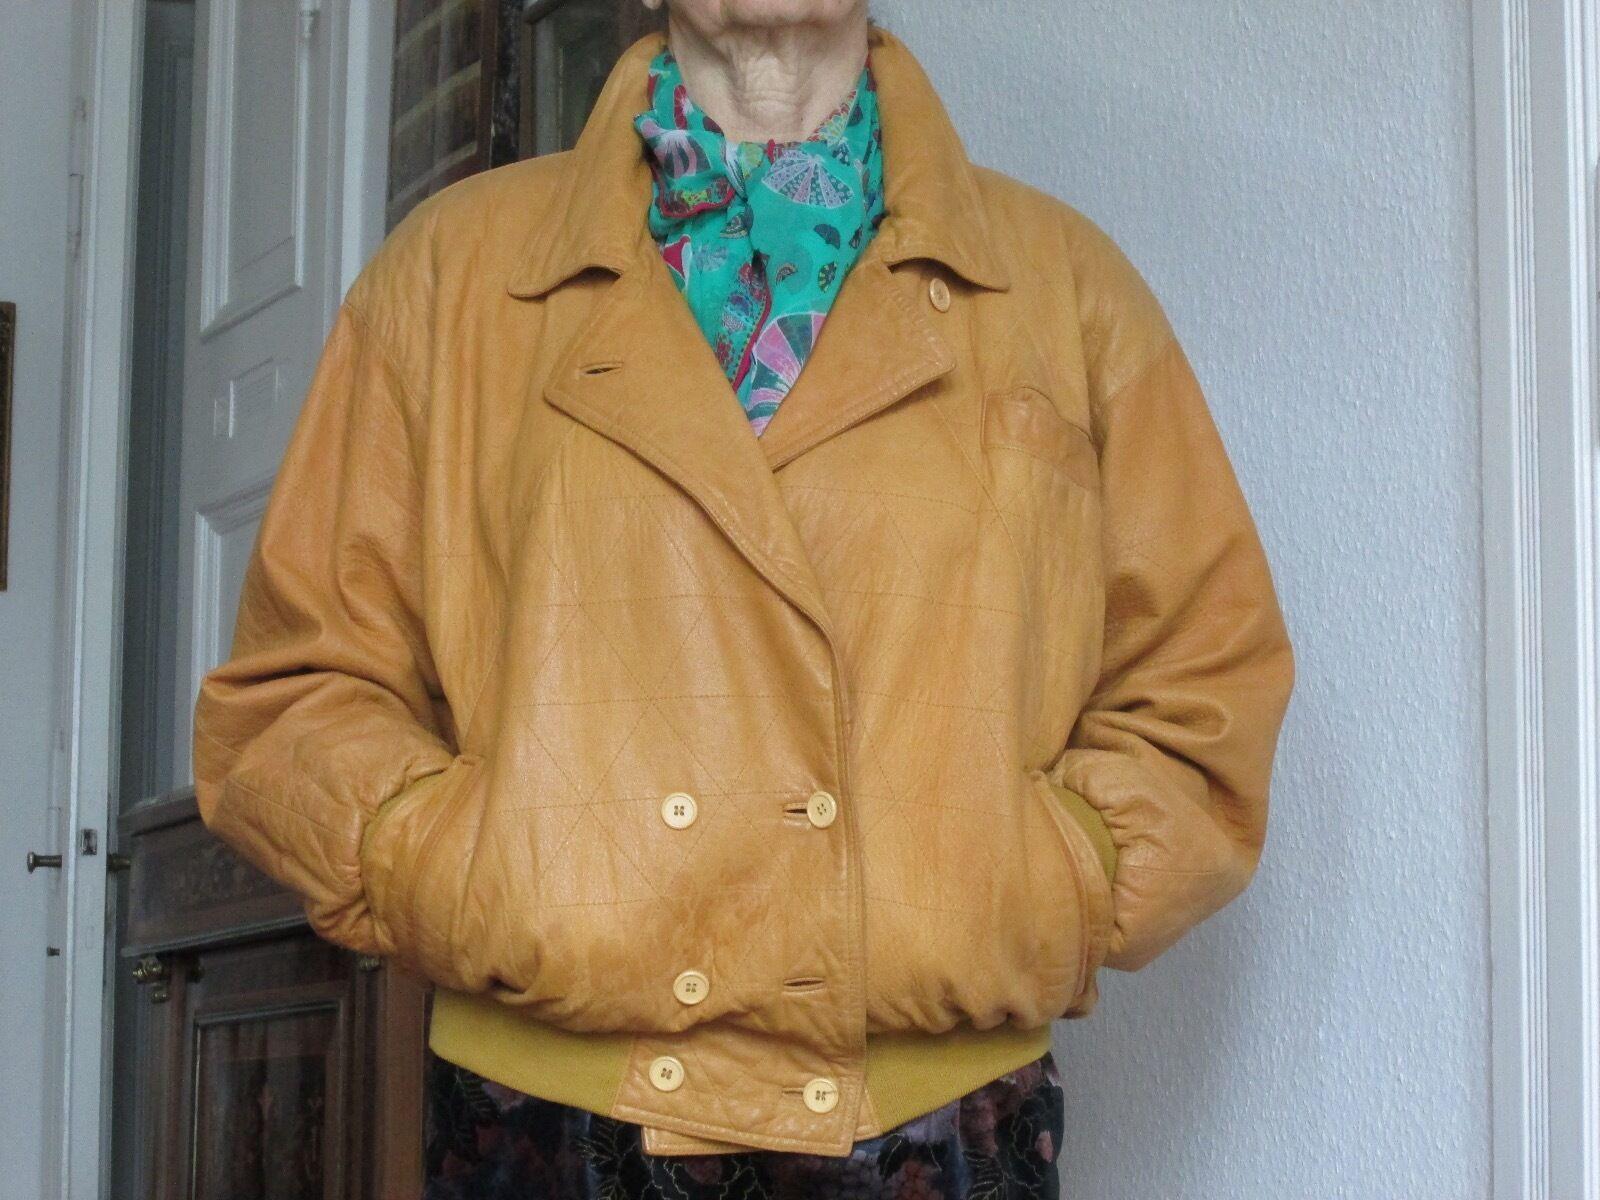 Giacca Giubbotto in di Vera PELLE Uomo Slim Fit Fit Fit Ns Produzione Sped. Gratis  5s1 437c16